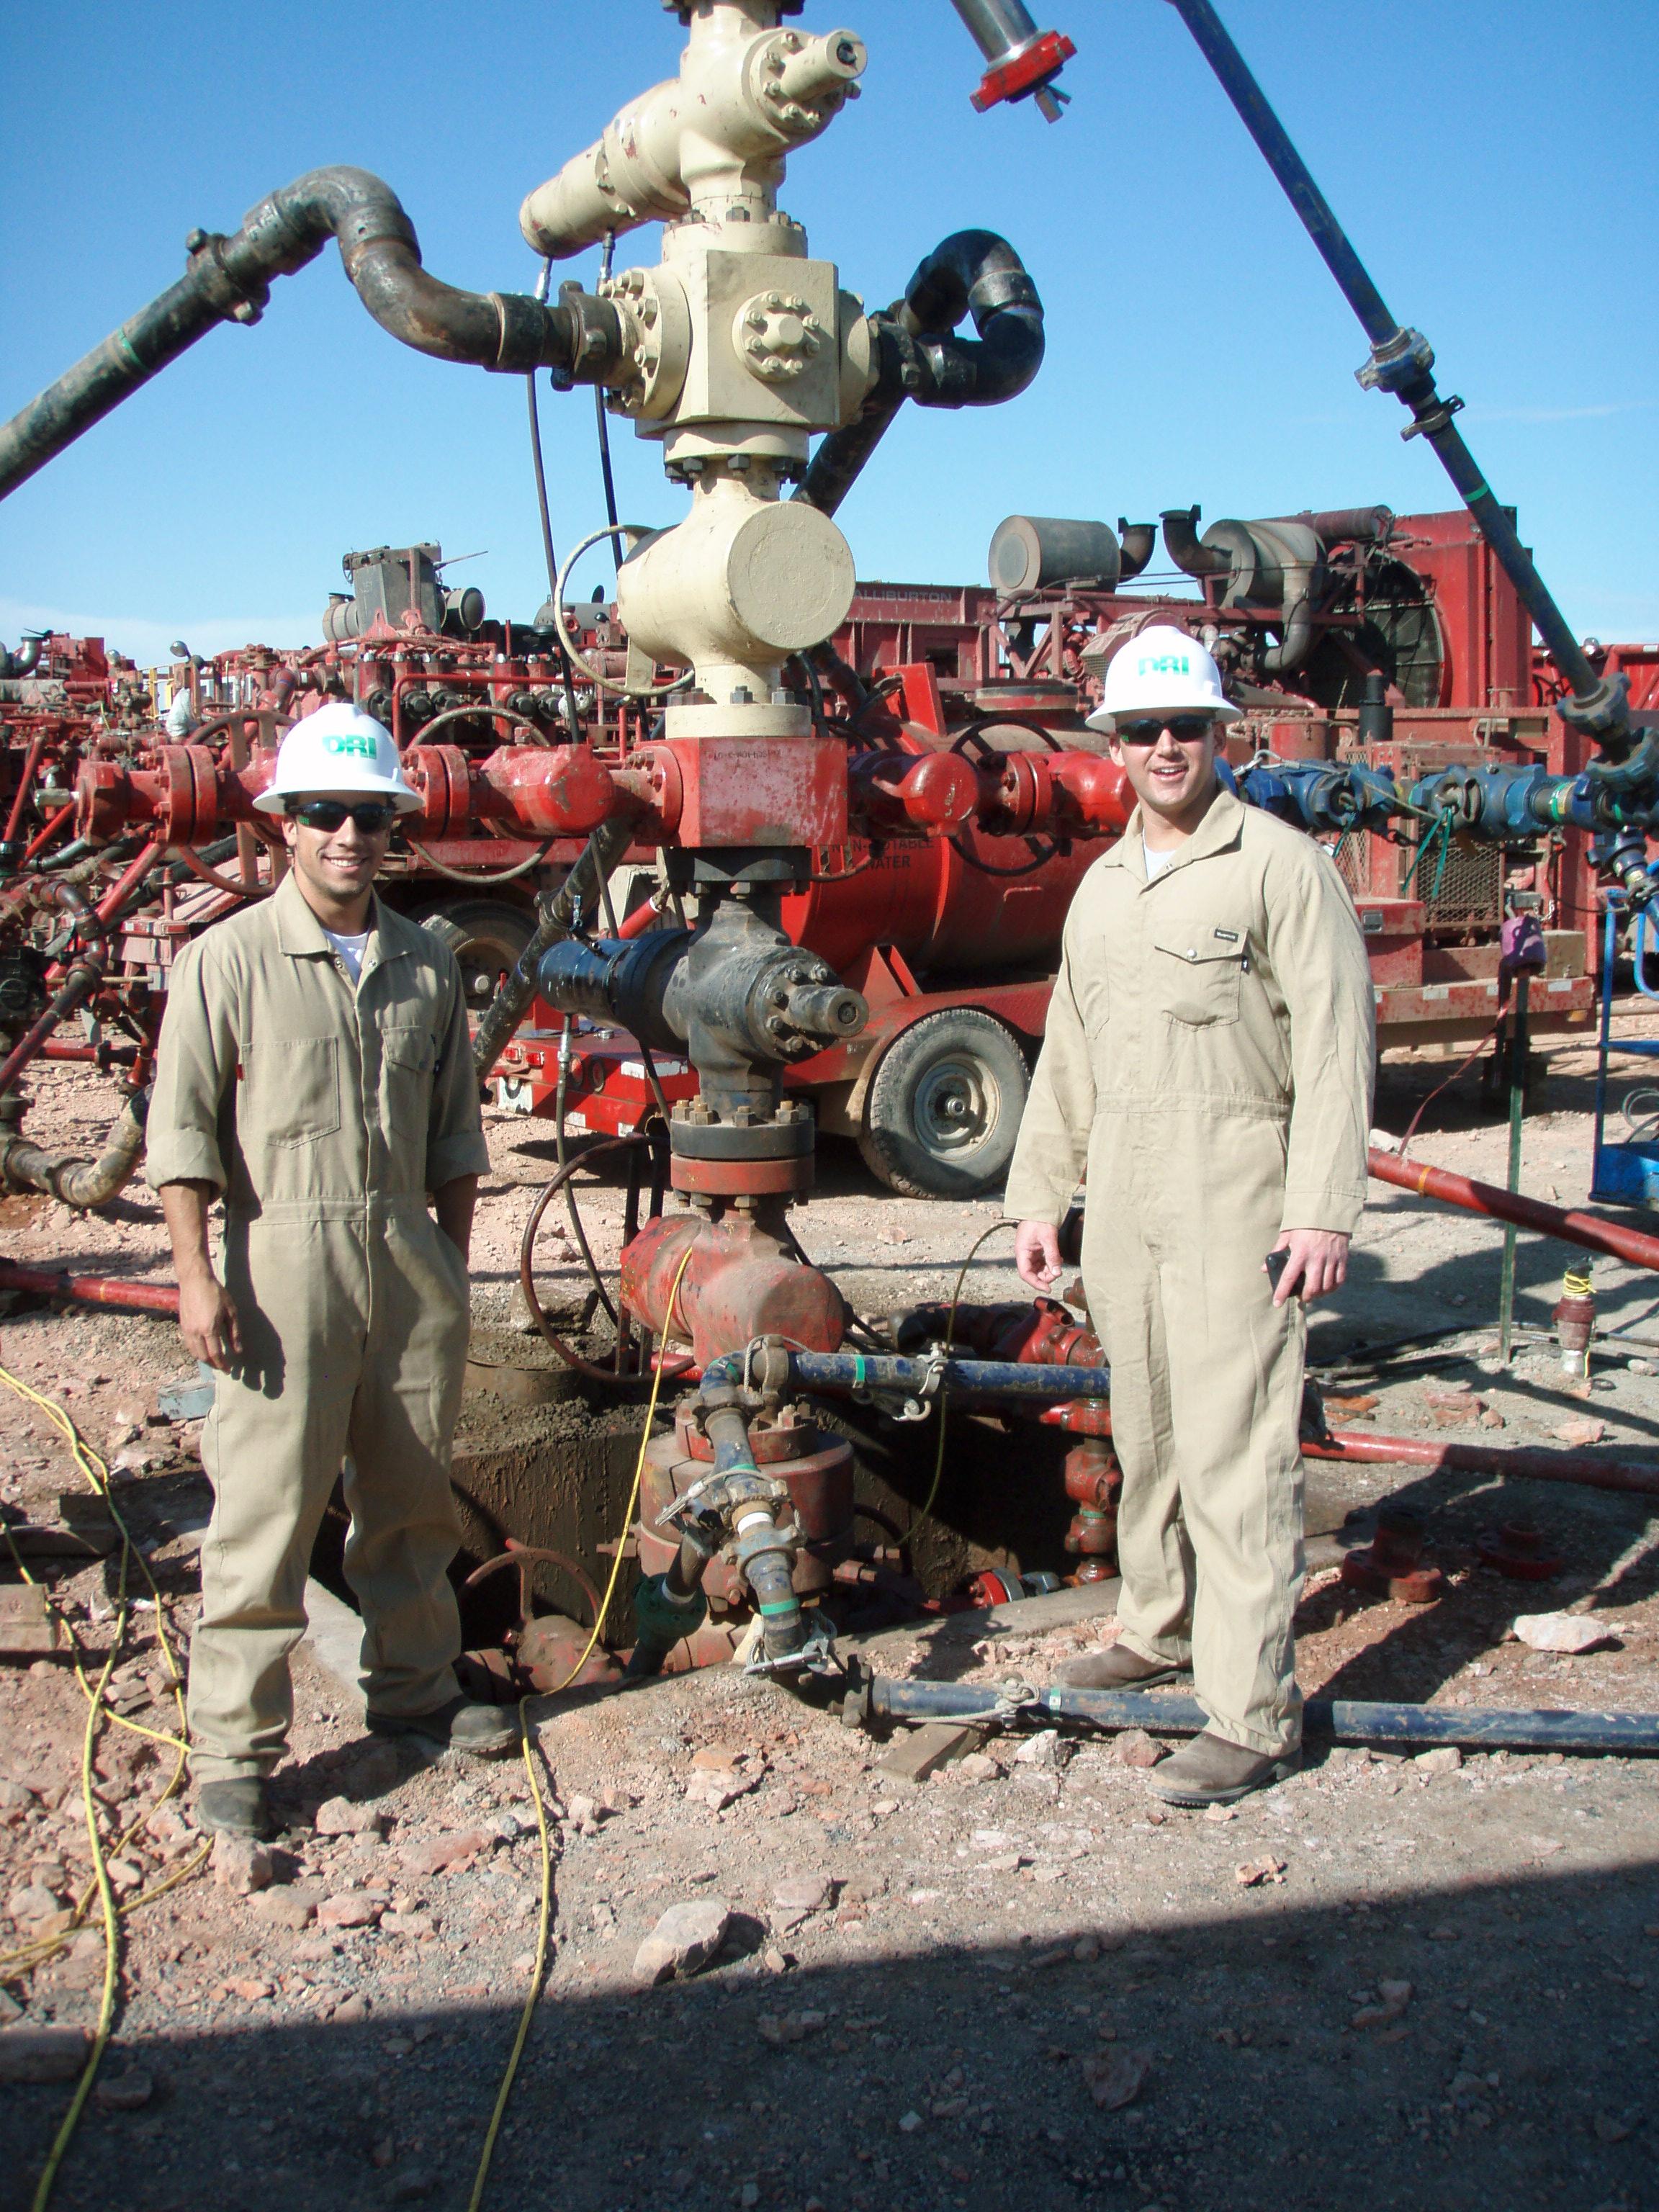 File:Head of the frac pump JPG - Wikimedia Commons